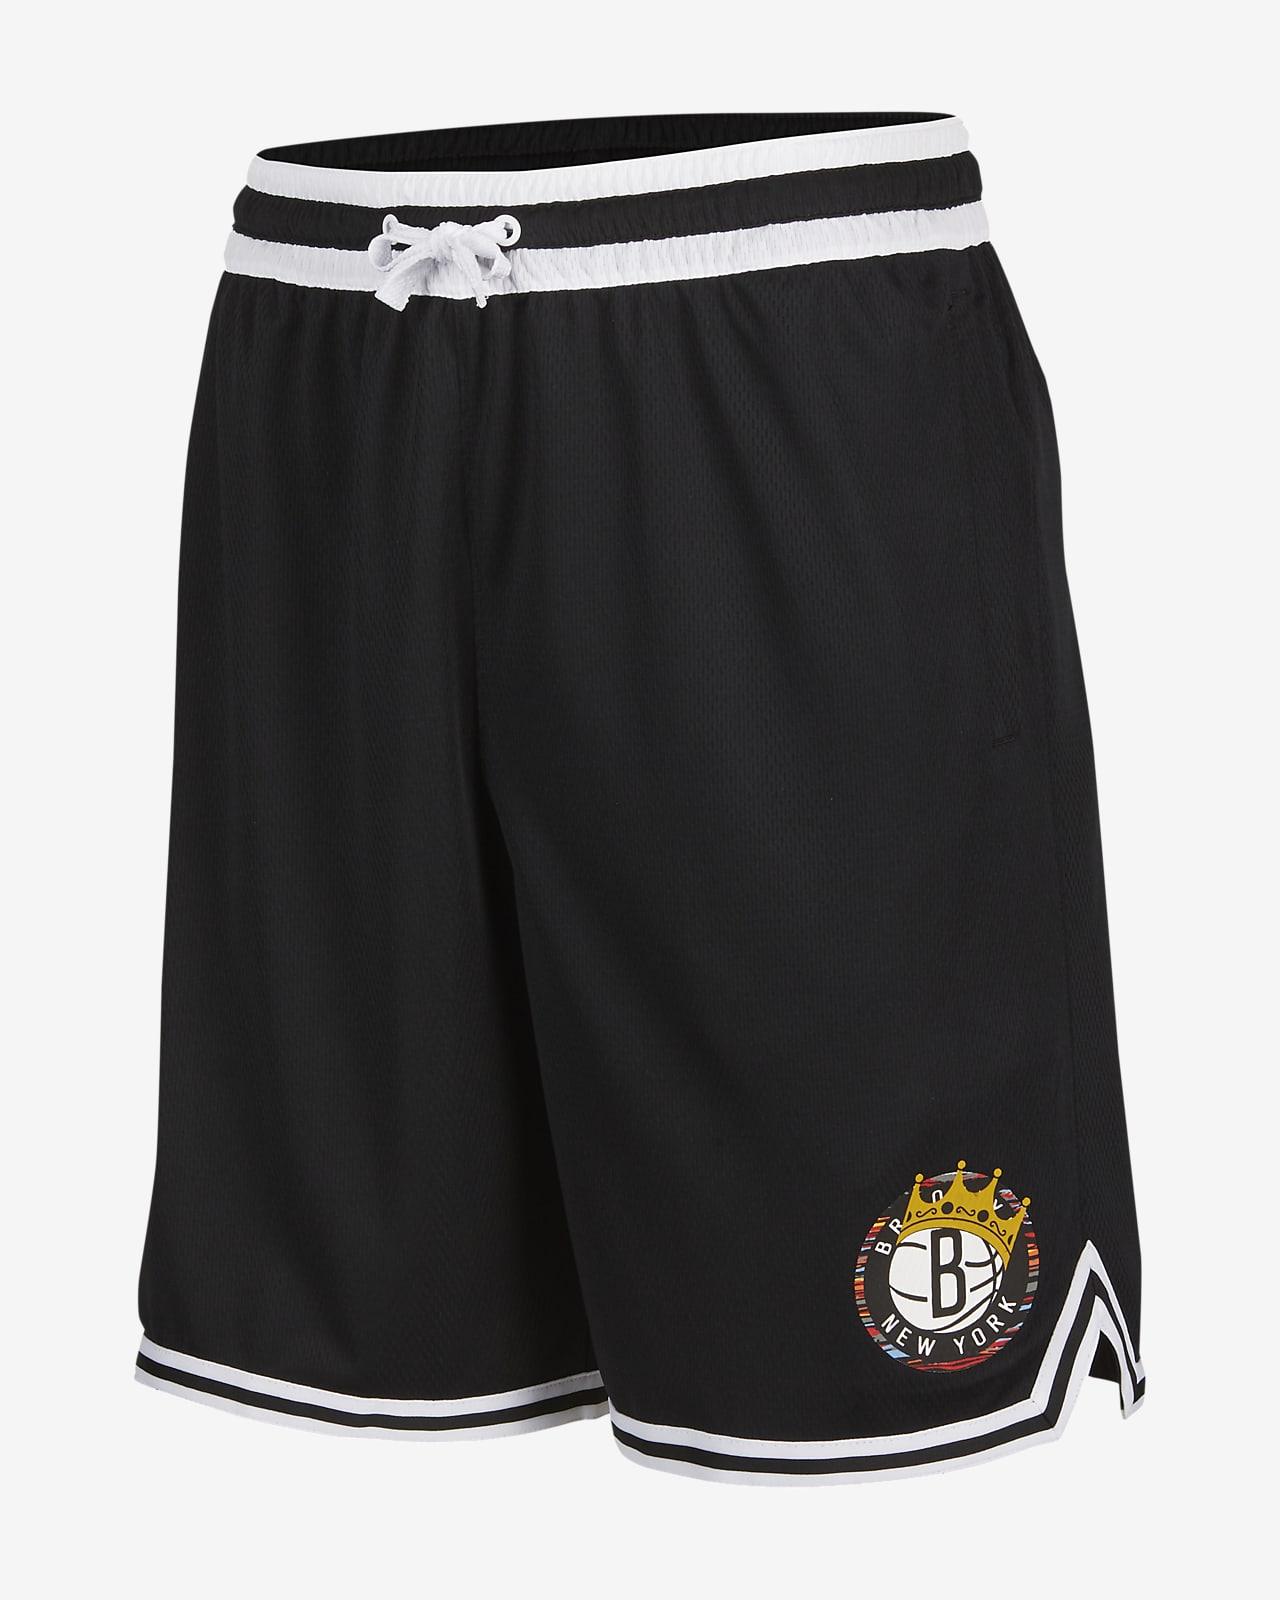 Brooklyn Nets DNA Biggie Nike NBA Basketball Shorts